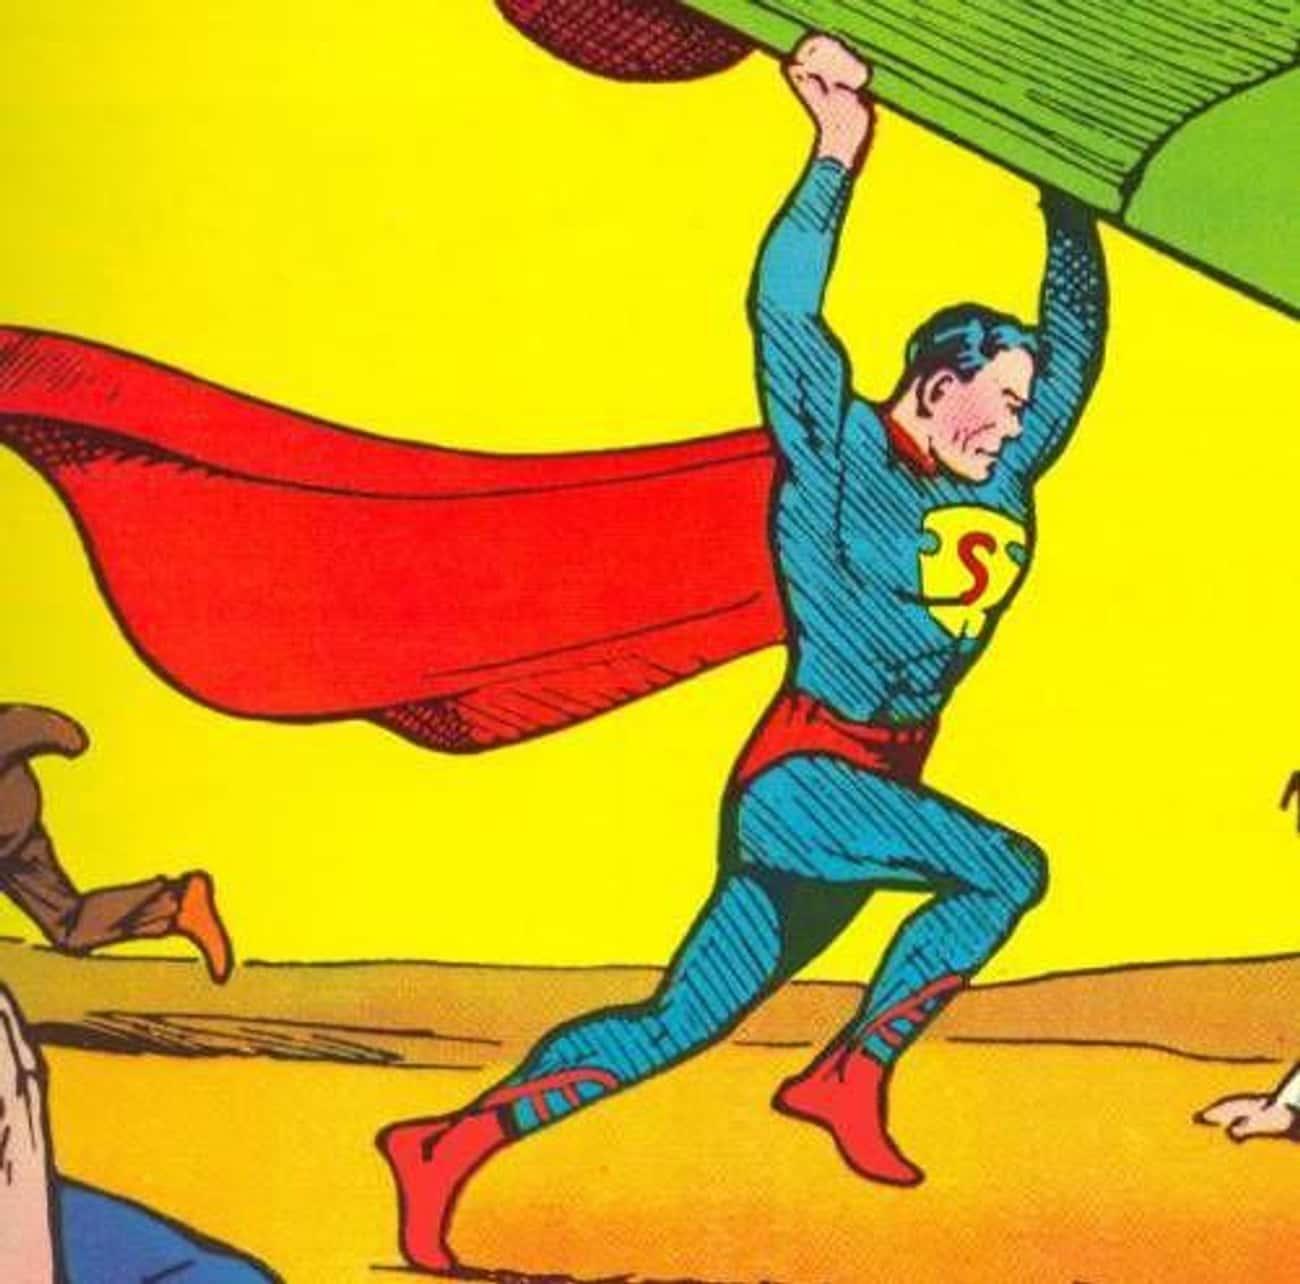 1938: Action Comics #1